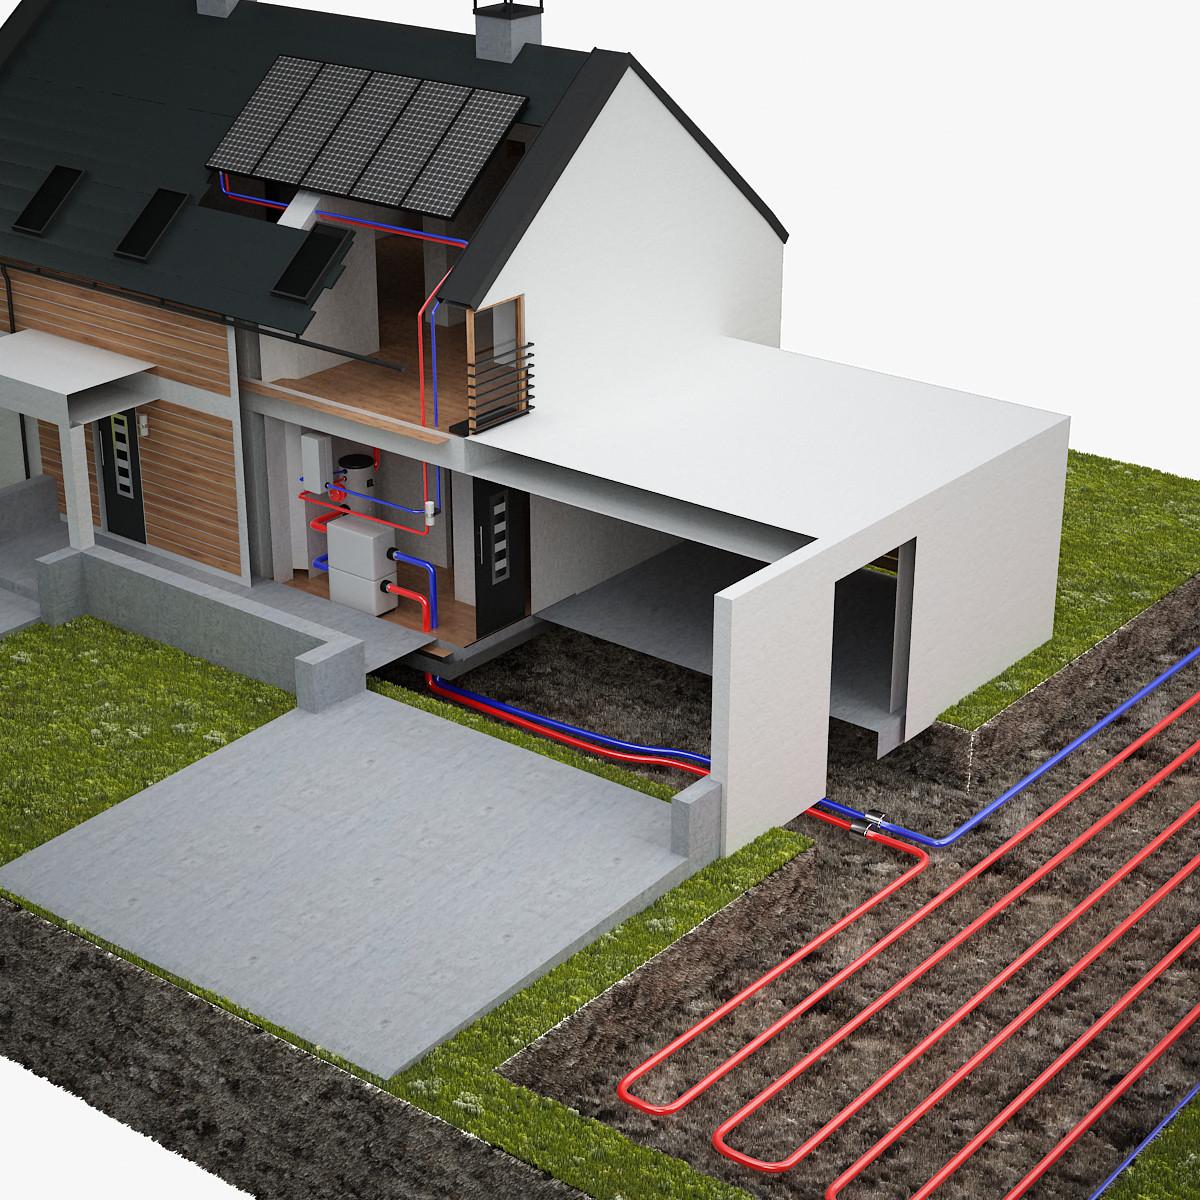 ısı pompası